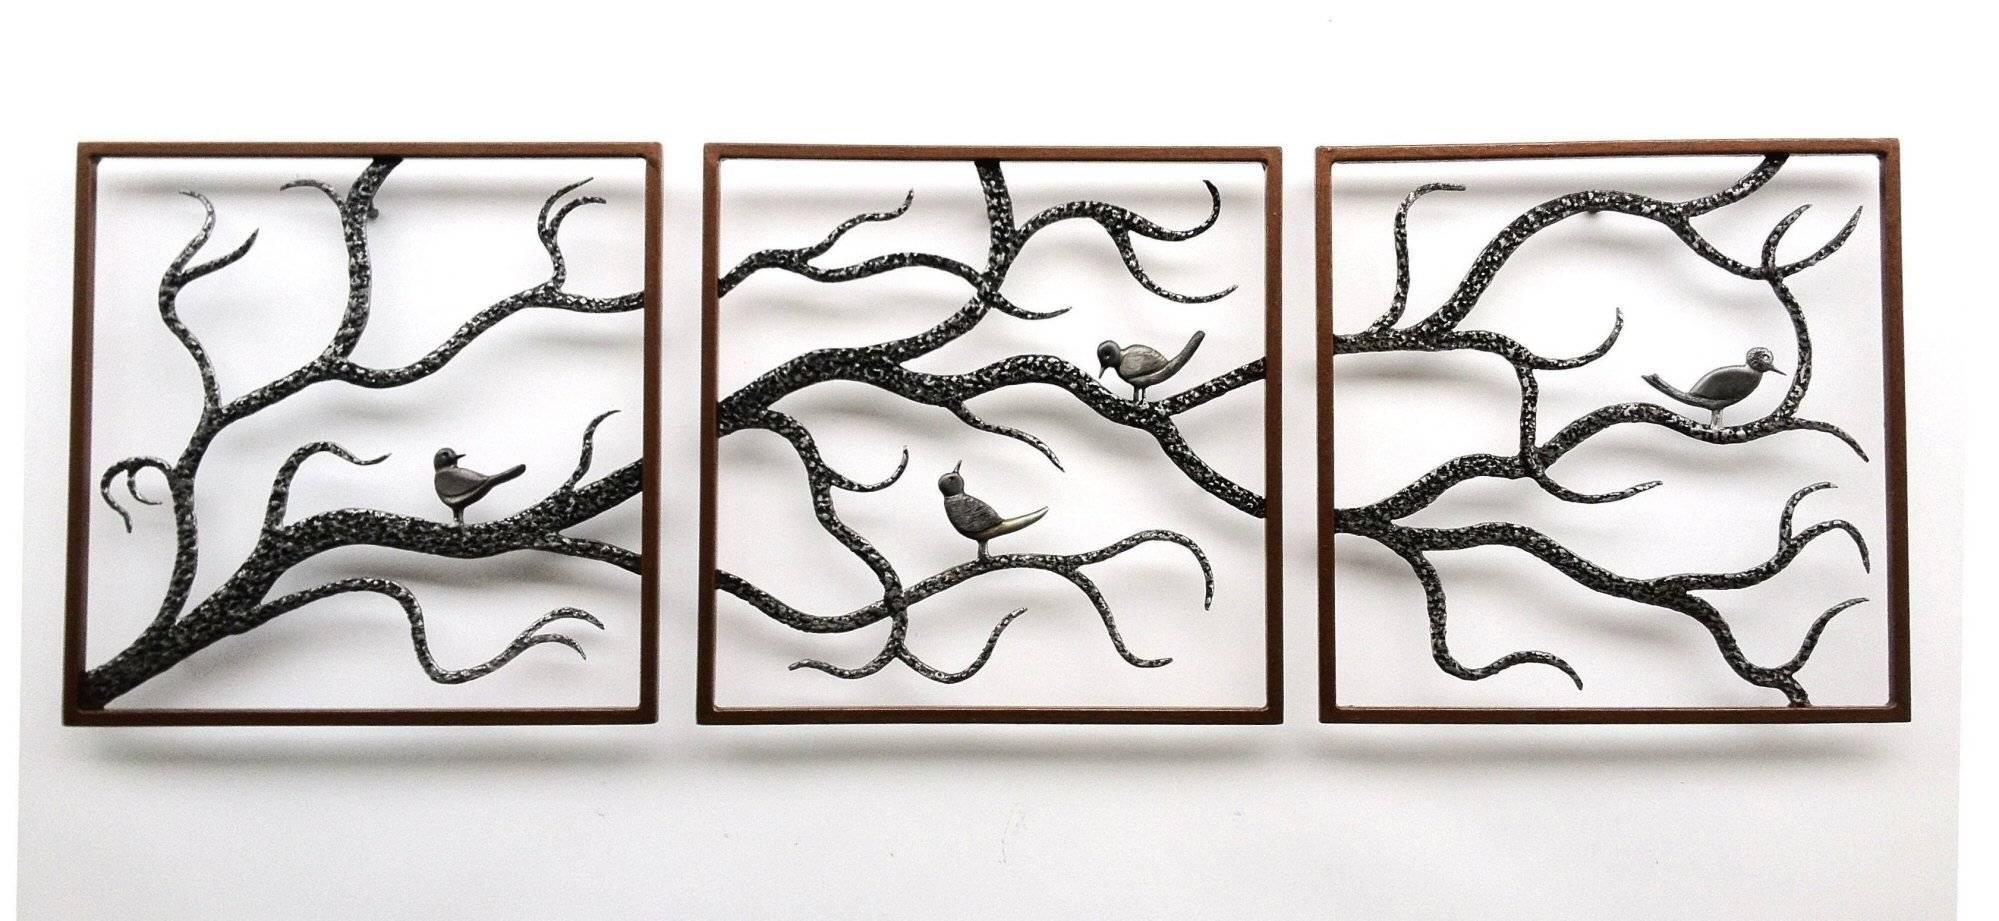 Wall Art Designs: Metal Wall Art Trees Birch Three Framed Cute Pertaining To Newest Framed Metal Wall Art (View 8 of 20)